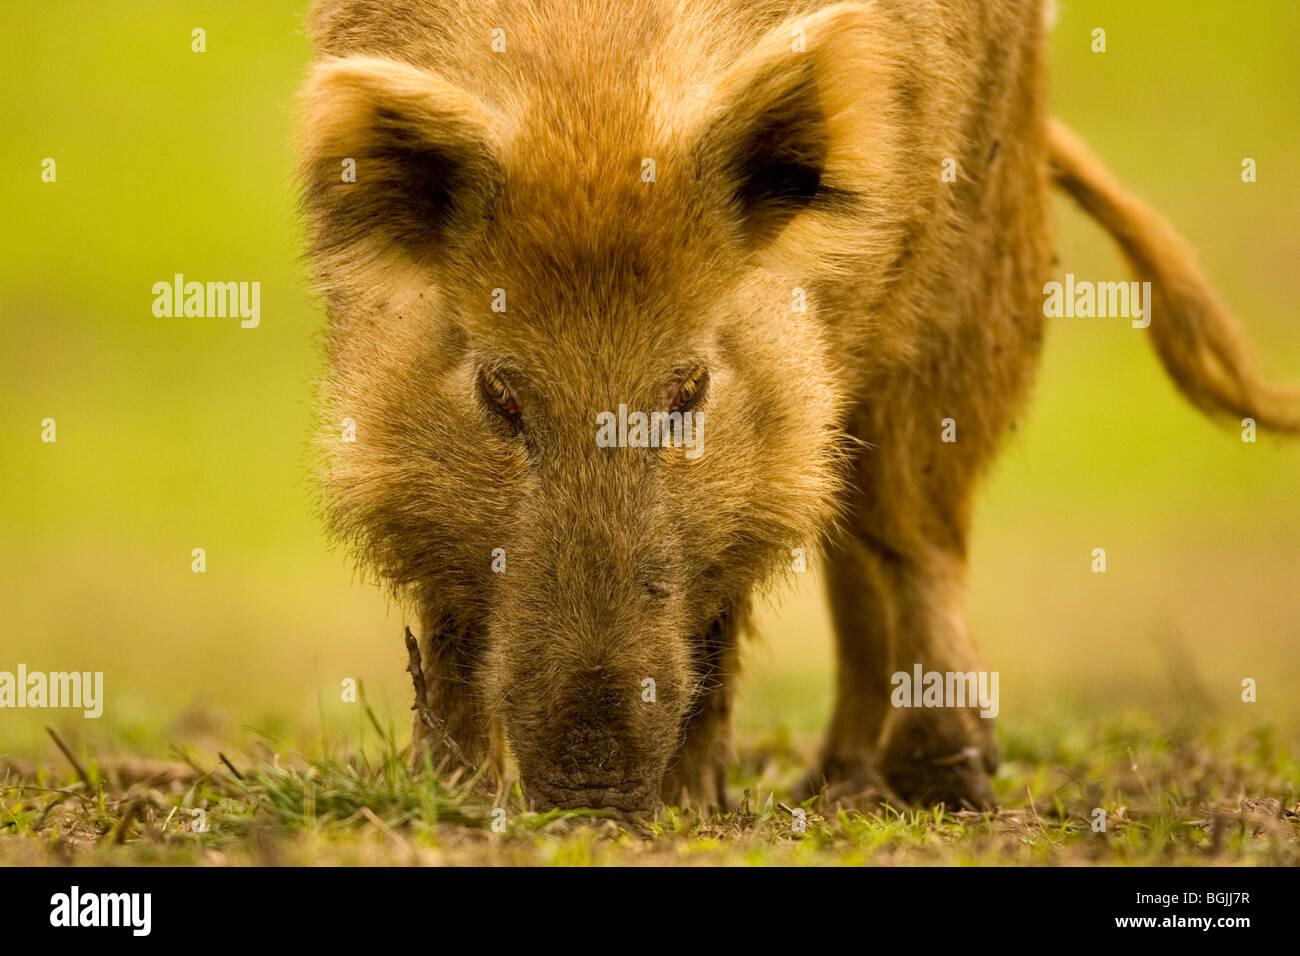 Feral Hogs on the Rio Vista Bluff Ranch, McFadden, TX - Stock Image